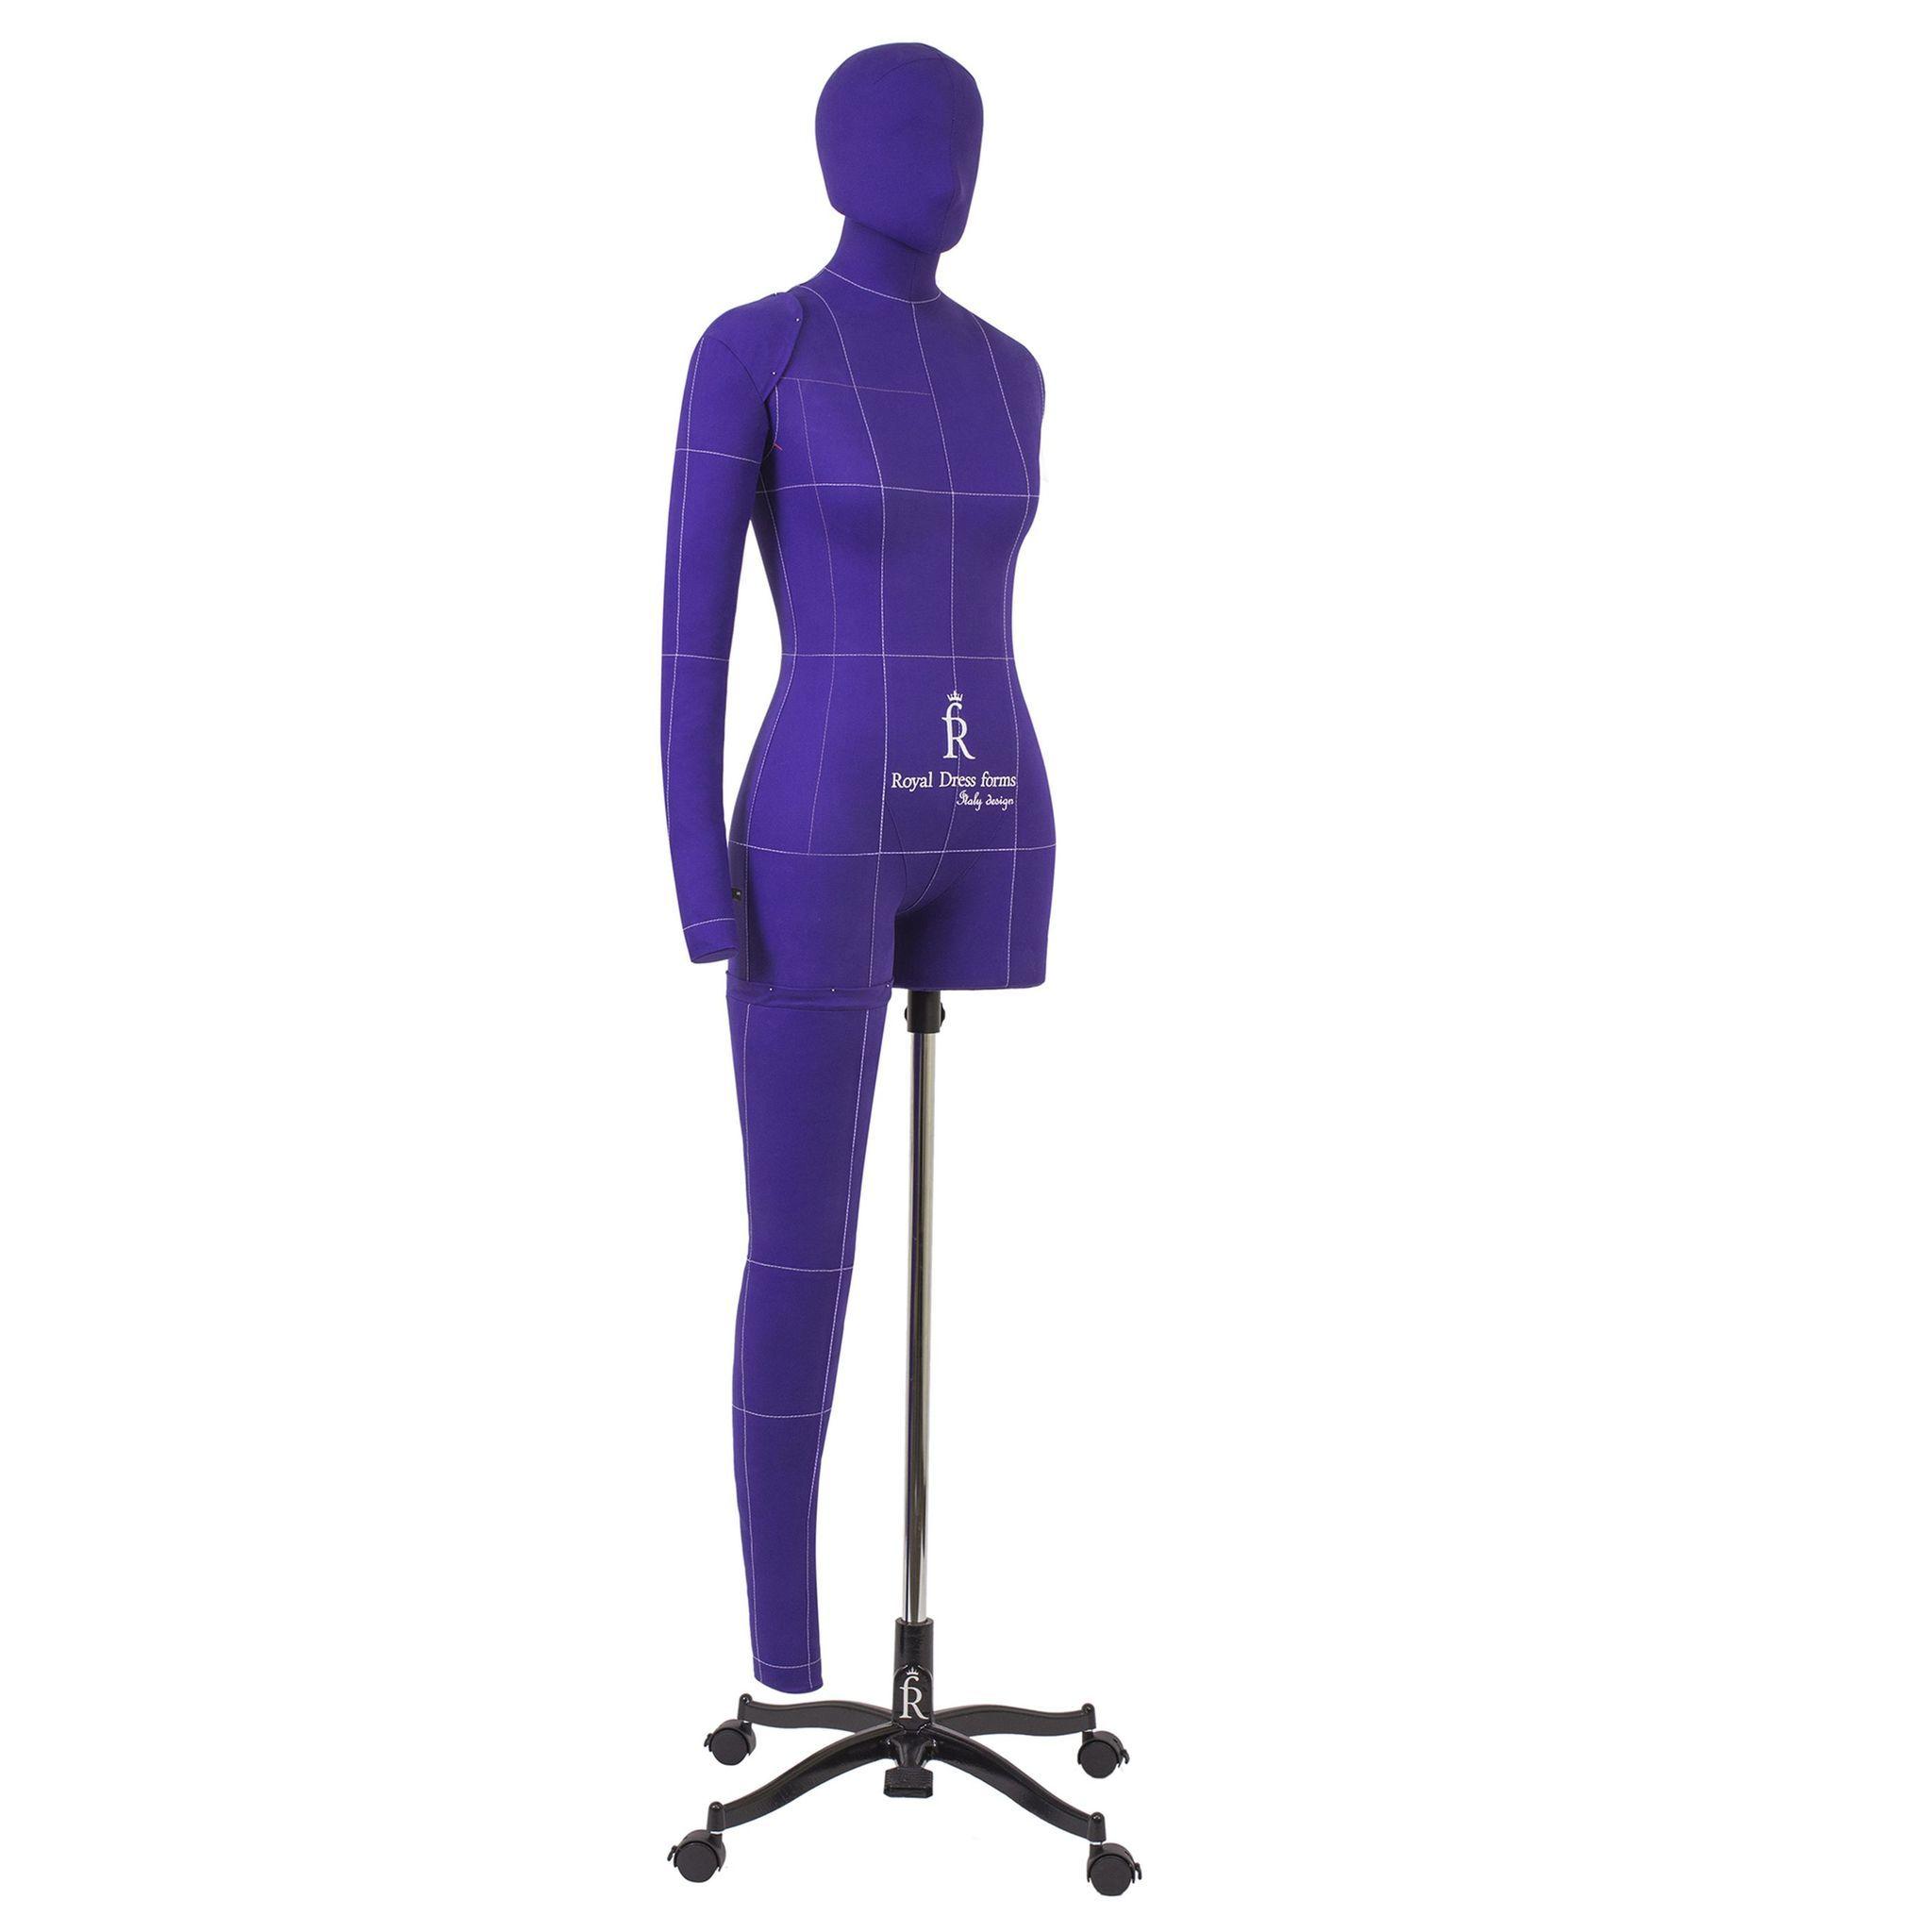 Манекен портновский Моника, комплект Арт, размер 44, ФиолетовыйФото 1